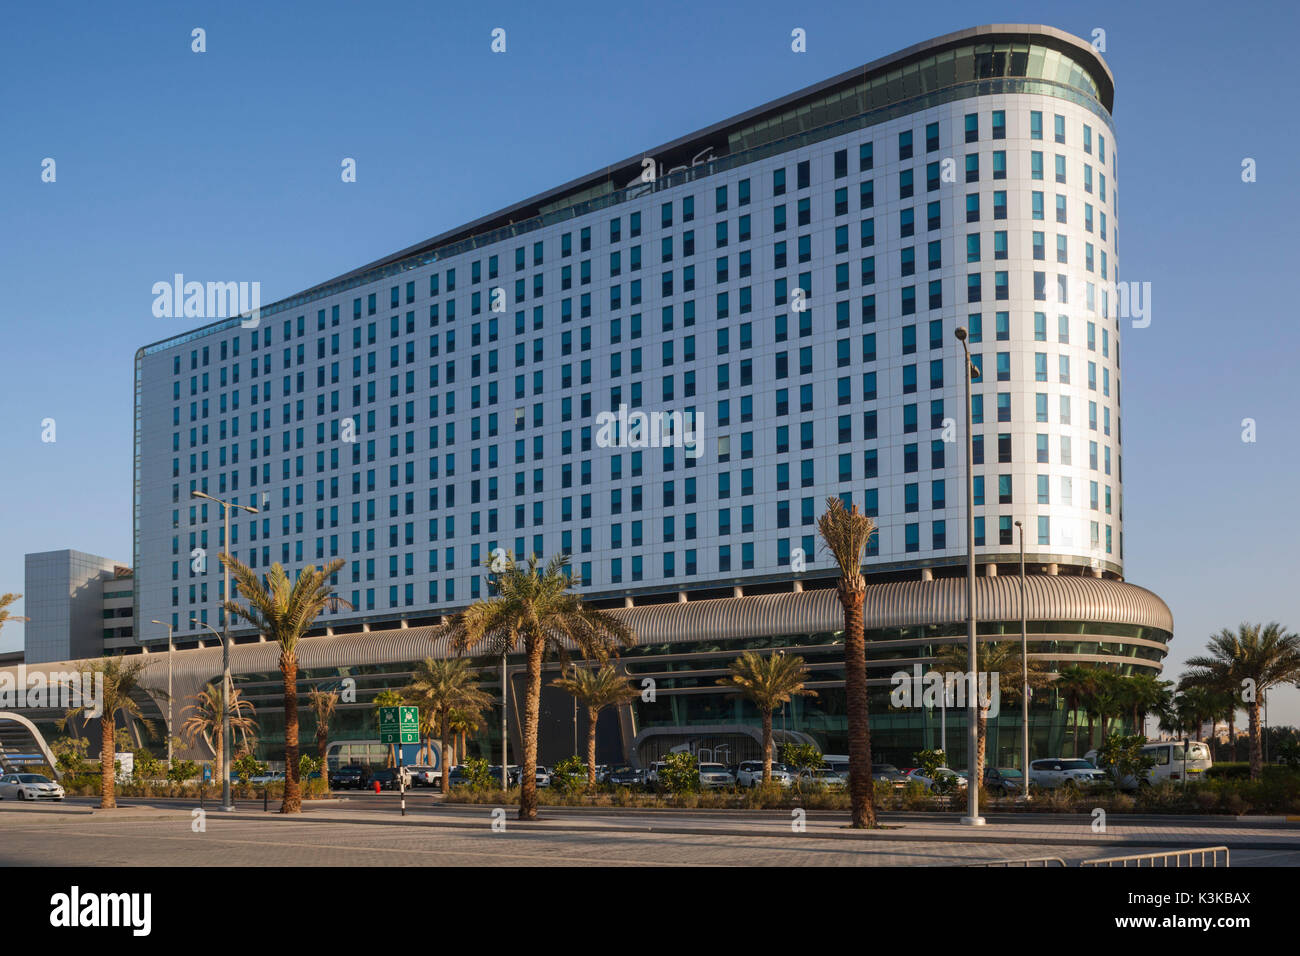 UAE, Abu Dhabi, Al Safarat Embassy Area, Aloft Hotel, exterior - Stock Image